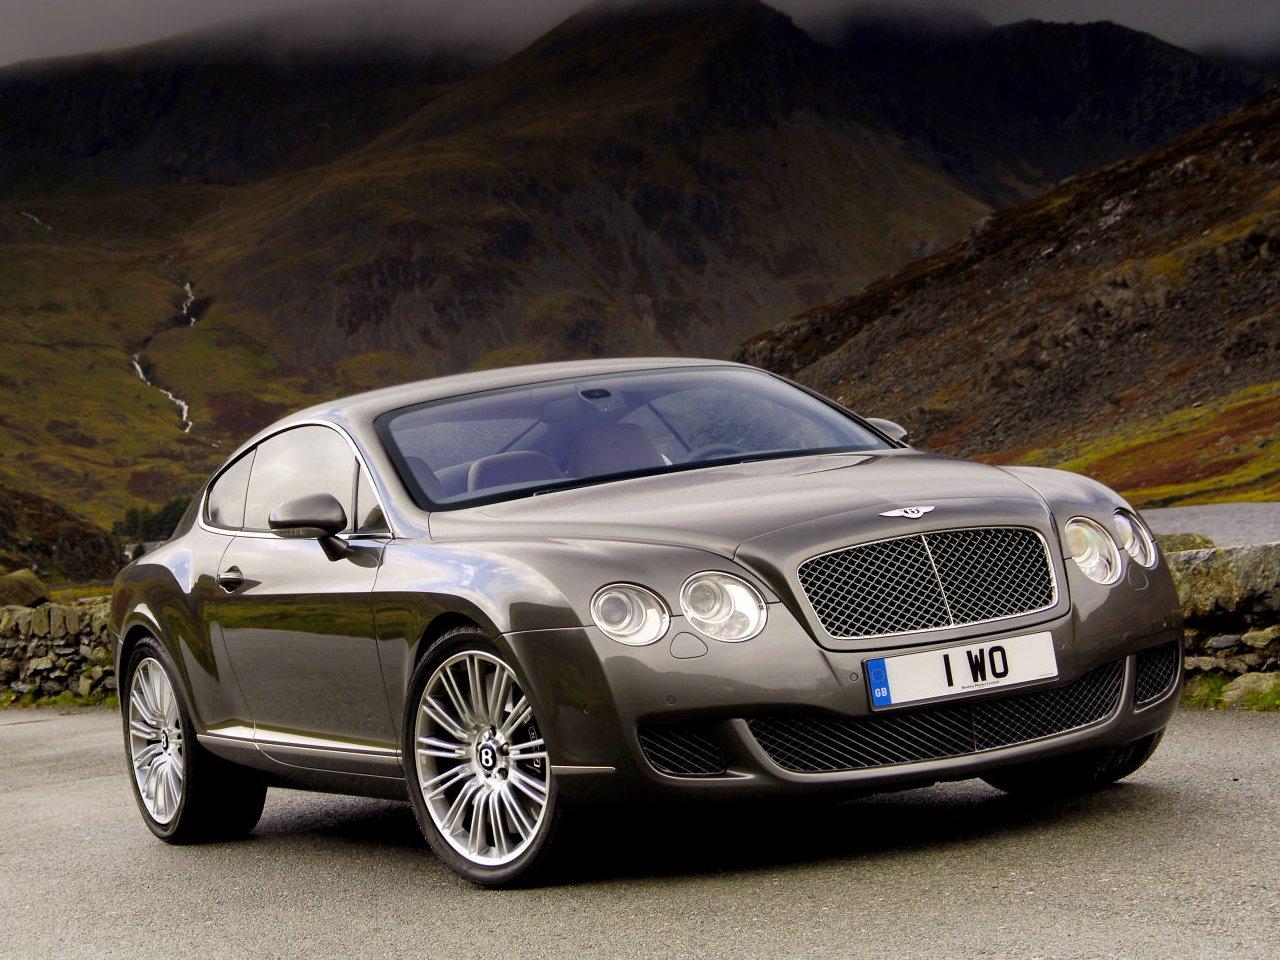 http://3.bp.blogspot.com/_NB_KYexR5Ms/TOC99CeLEtI/AAAAAAAAABo/DlT_l-hy3oQ/s1600/Bentley_Continental_GT_Speed_wallpaper.jpg